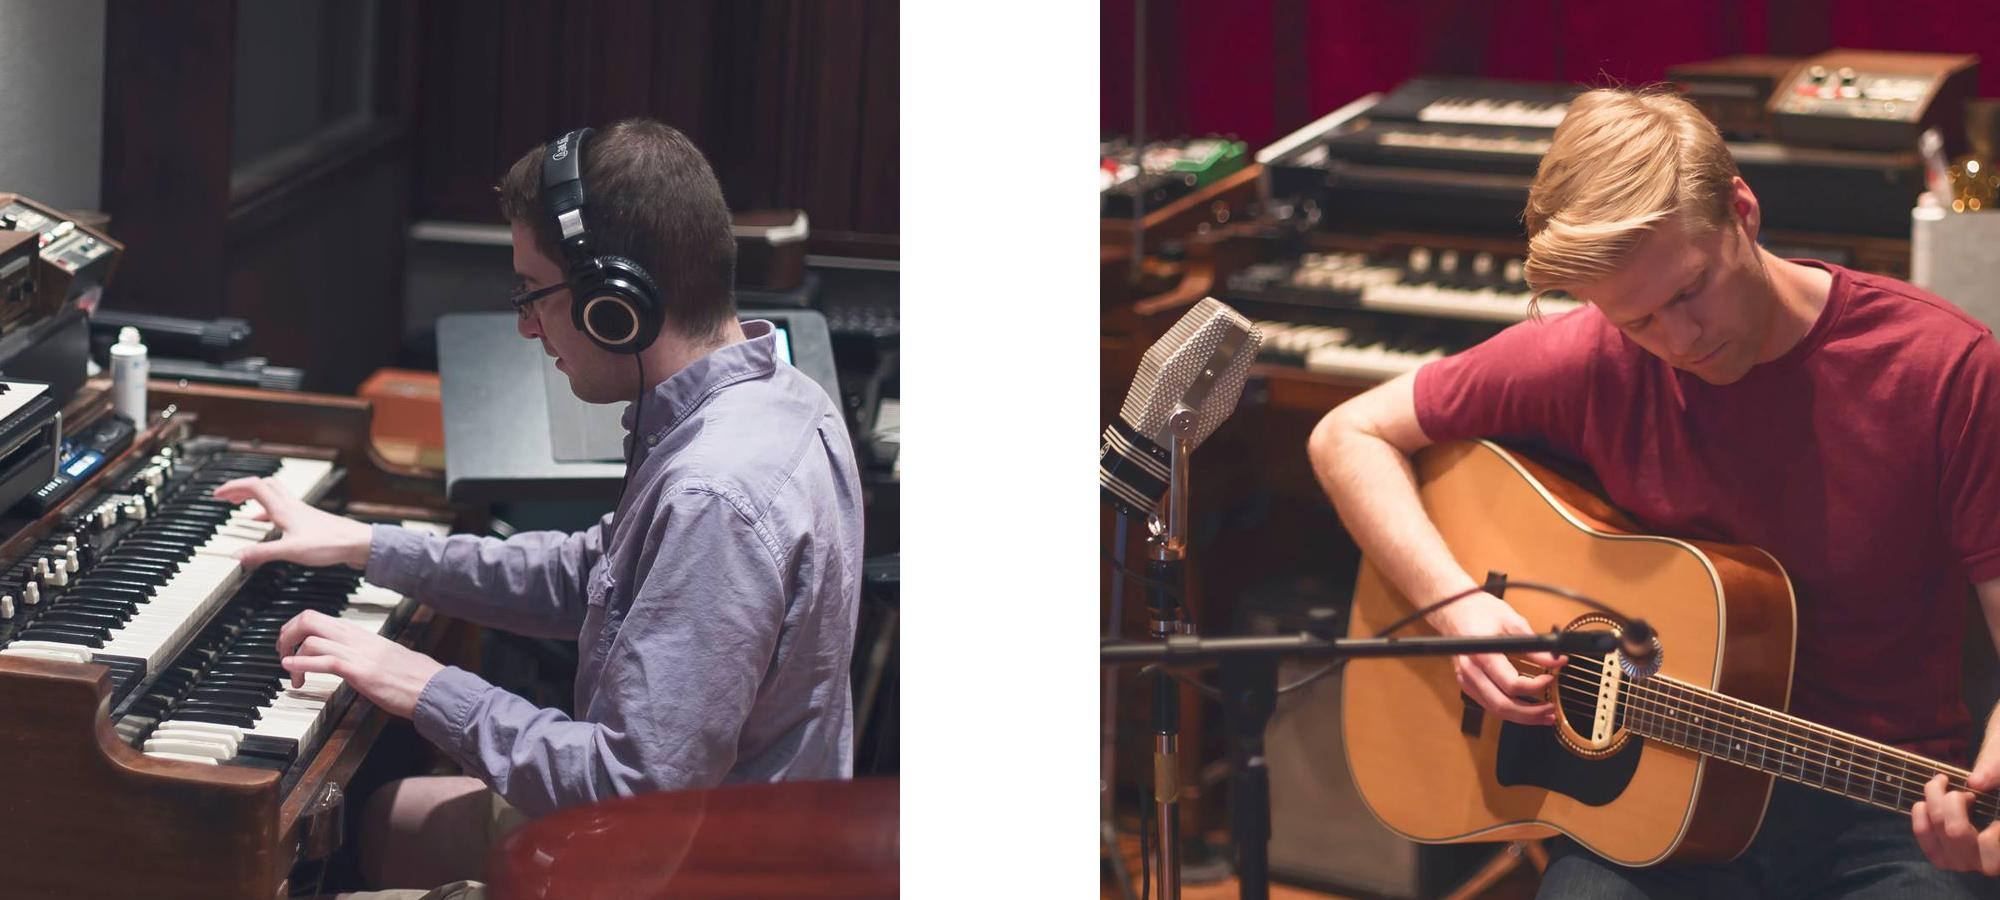 The Soloists - Patrick Kochyan & Eric VanBuhler